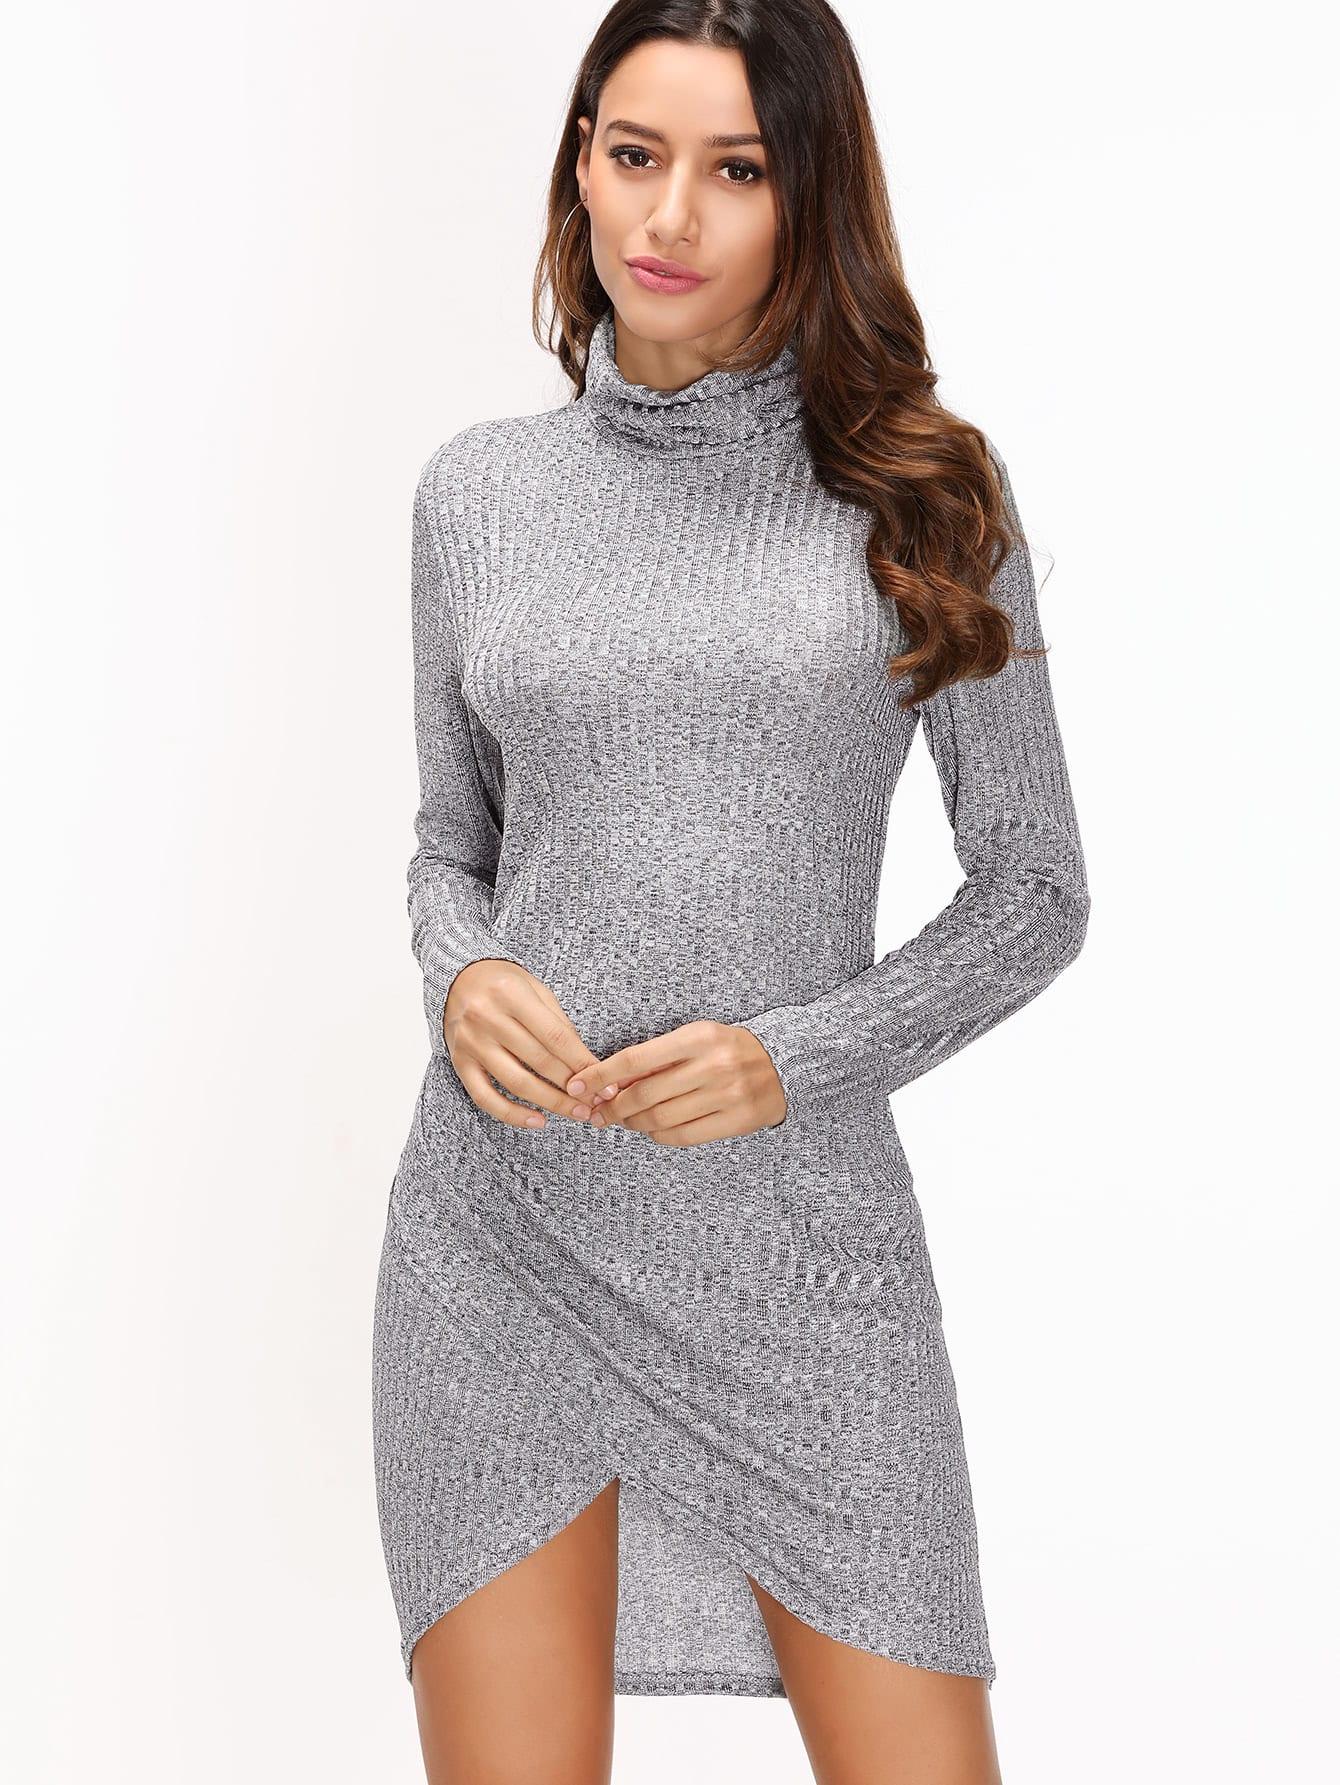 Grey Ribbed High Neck Dip Hem Dress dress161118102